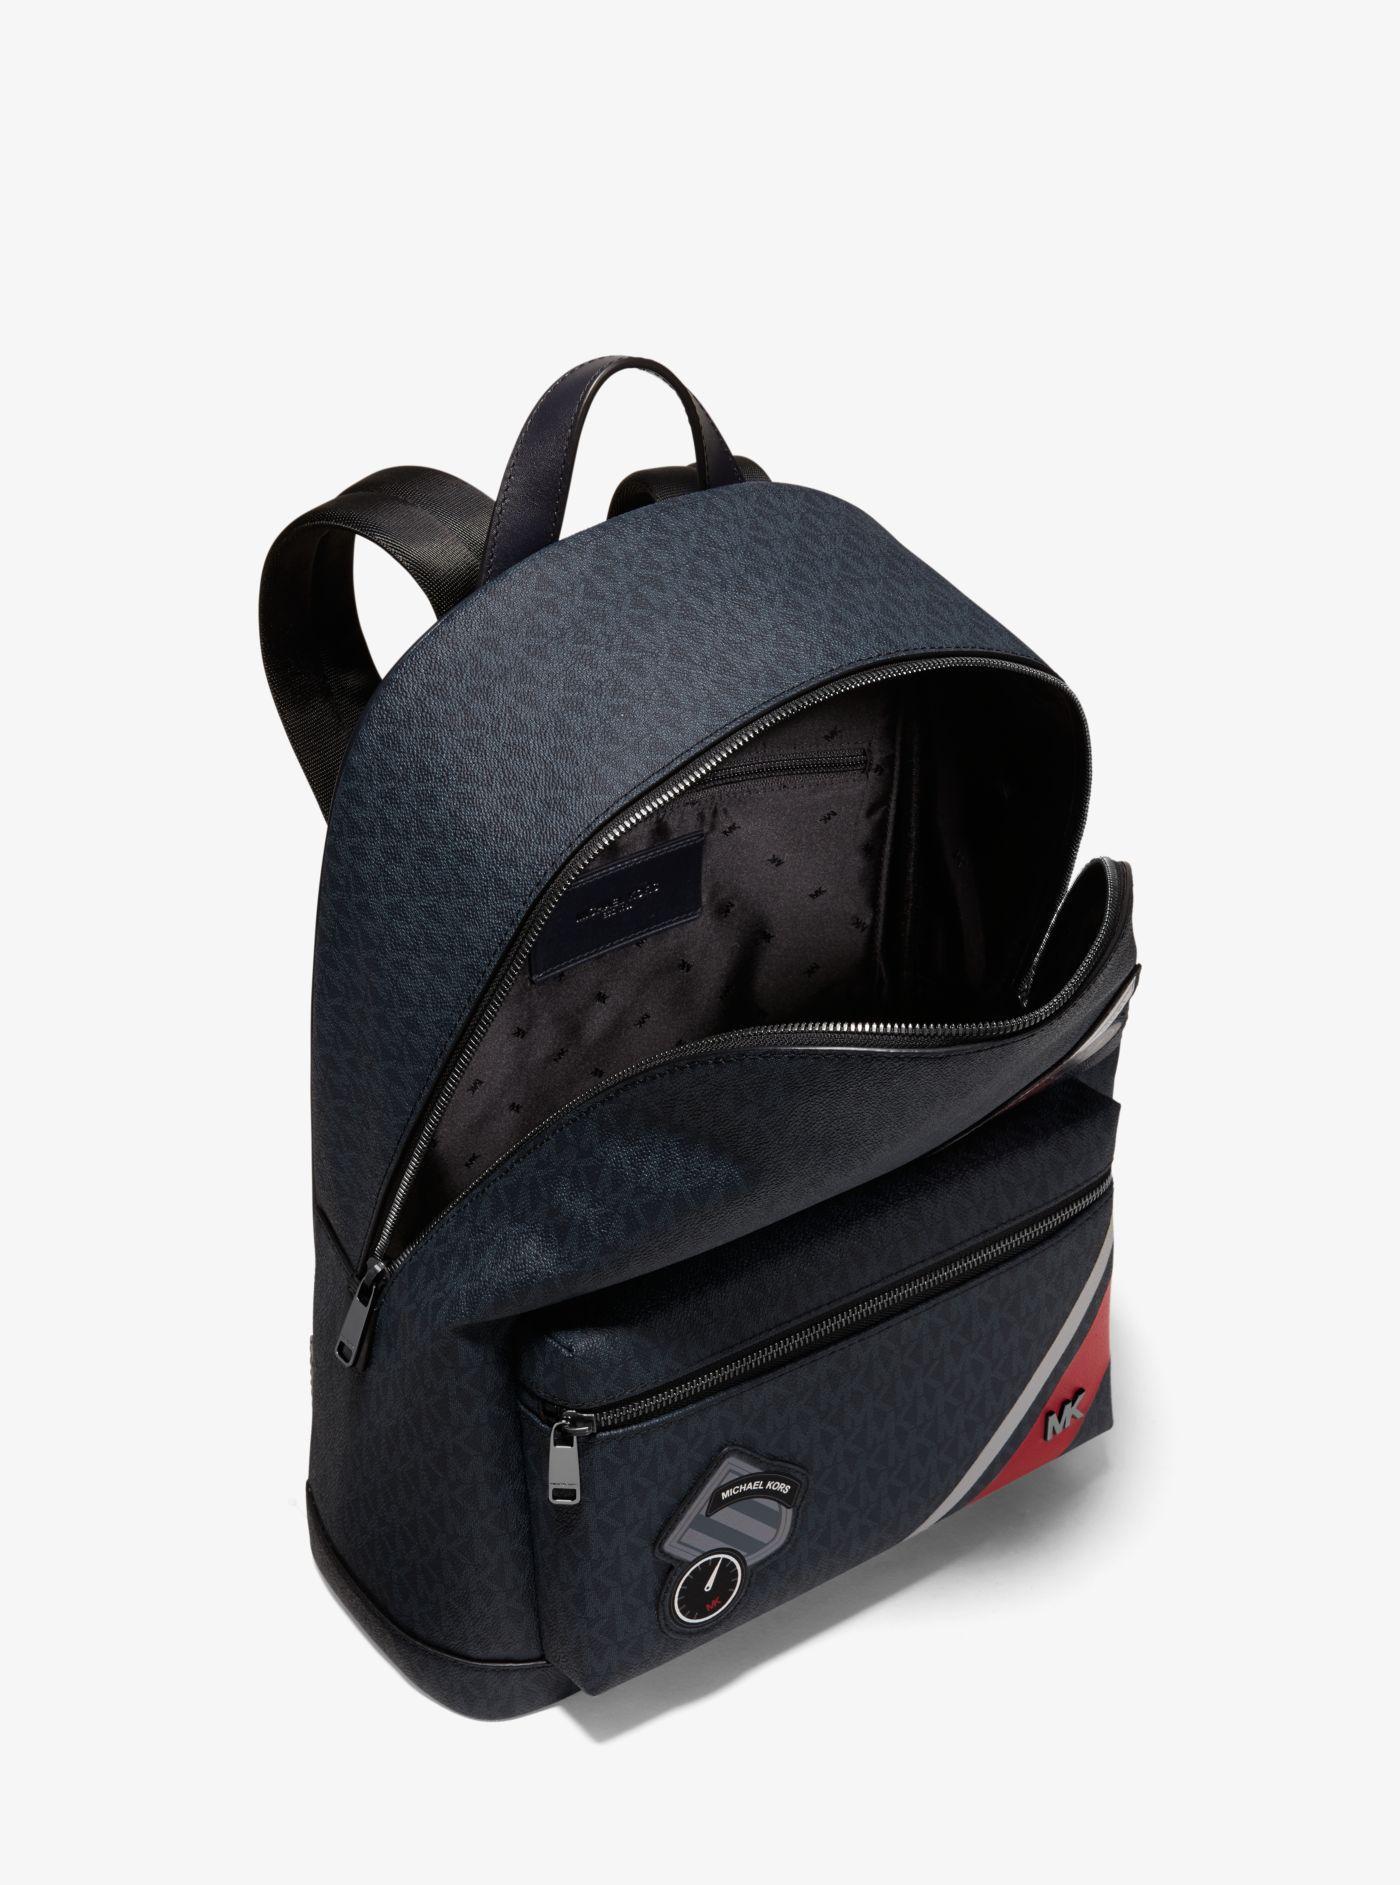 2c6894a7ffa4 Michael Kors - Blue Jet Set Backpack for Men - Lyst. View fullscreen